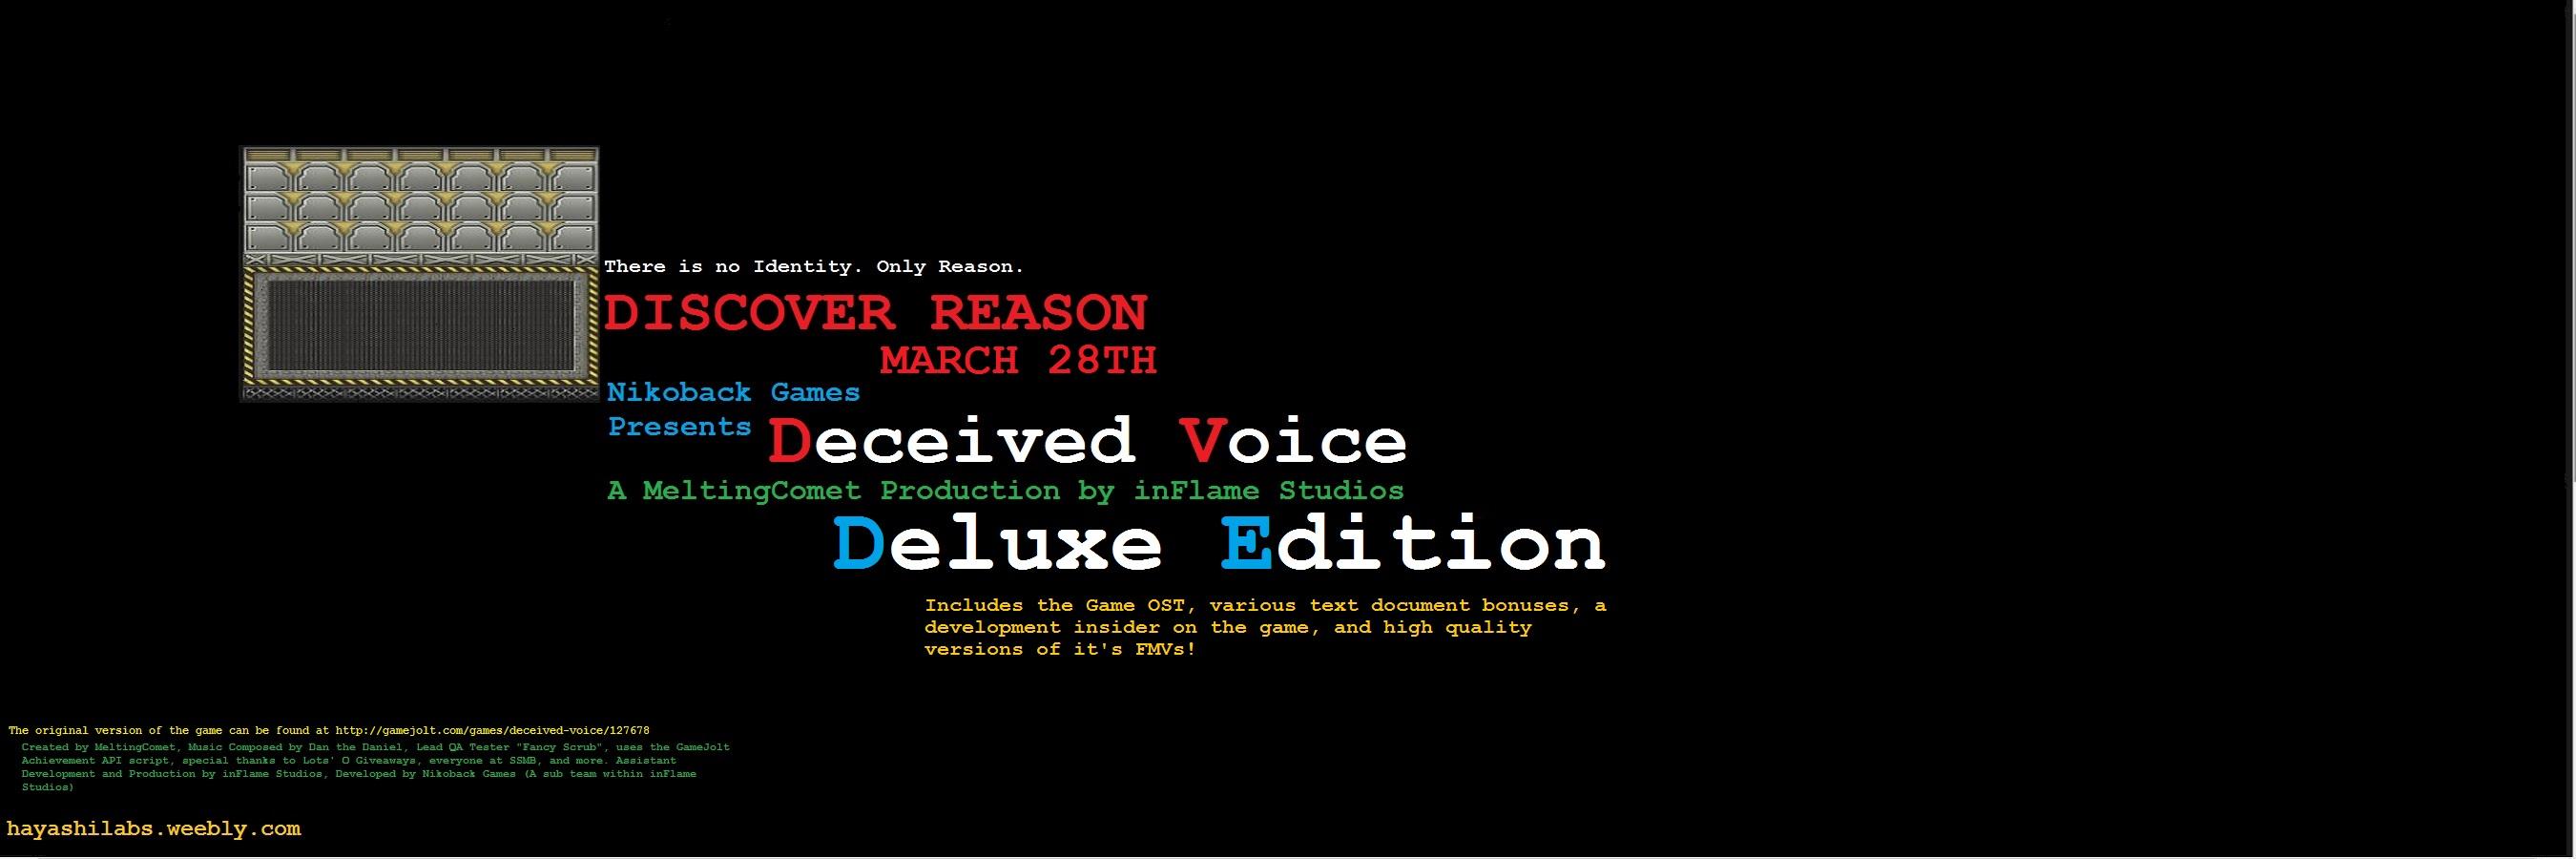 Deceived Voice